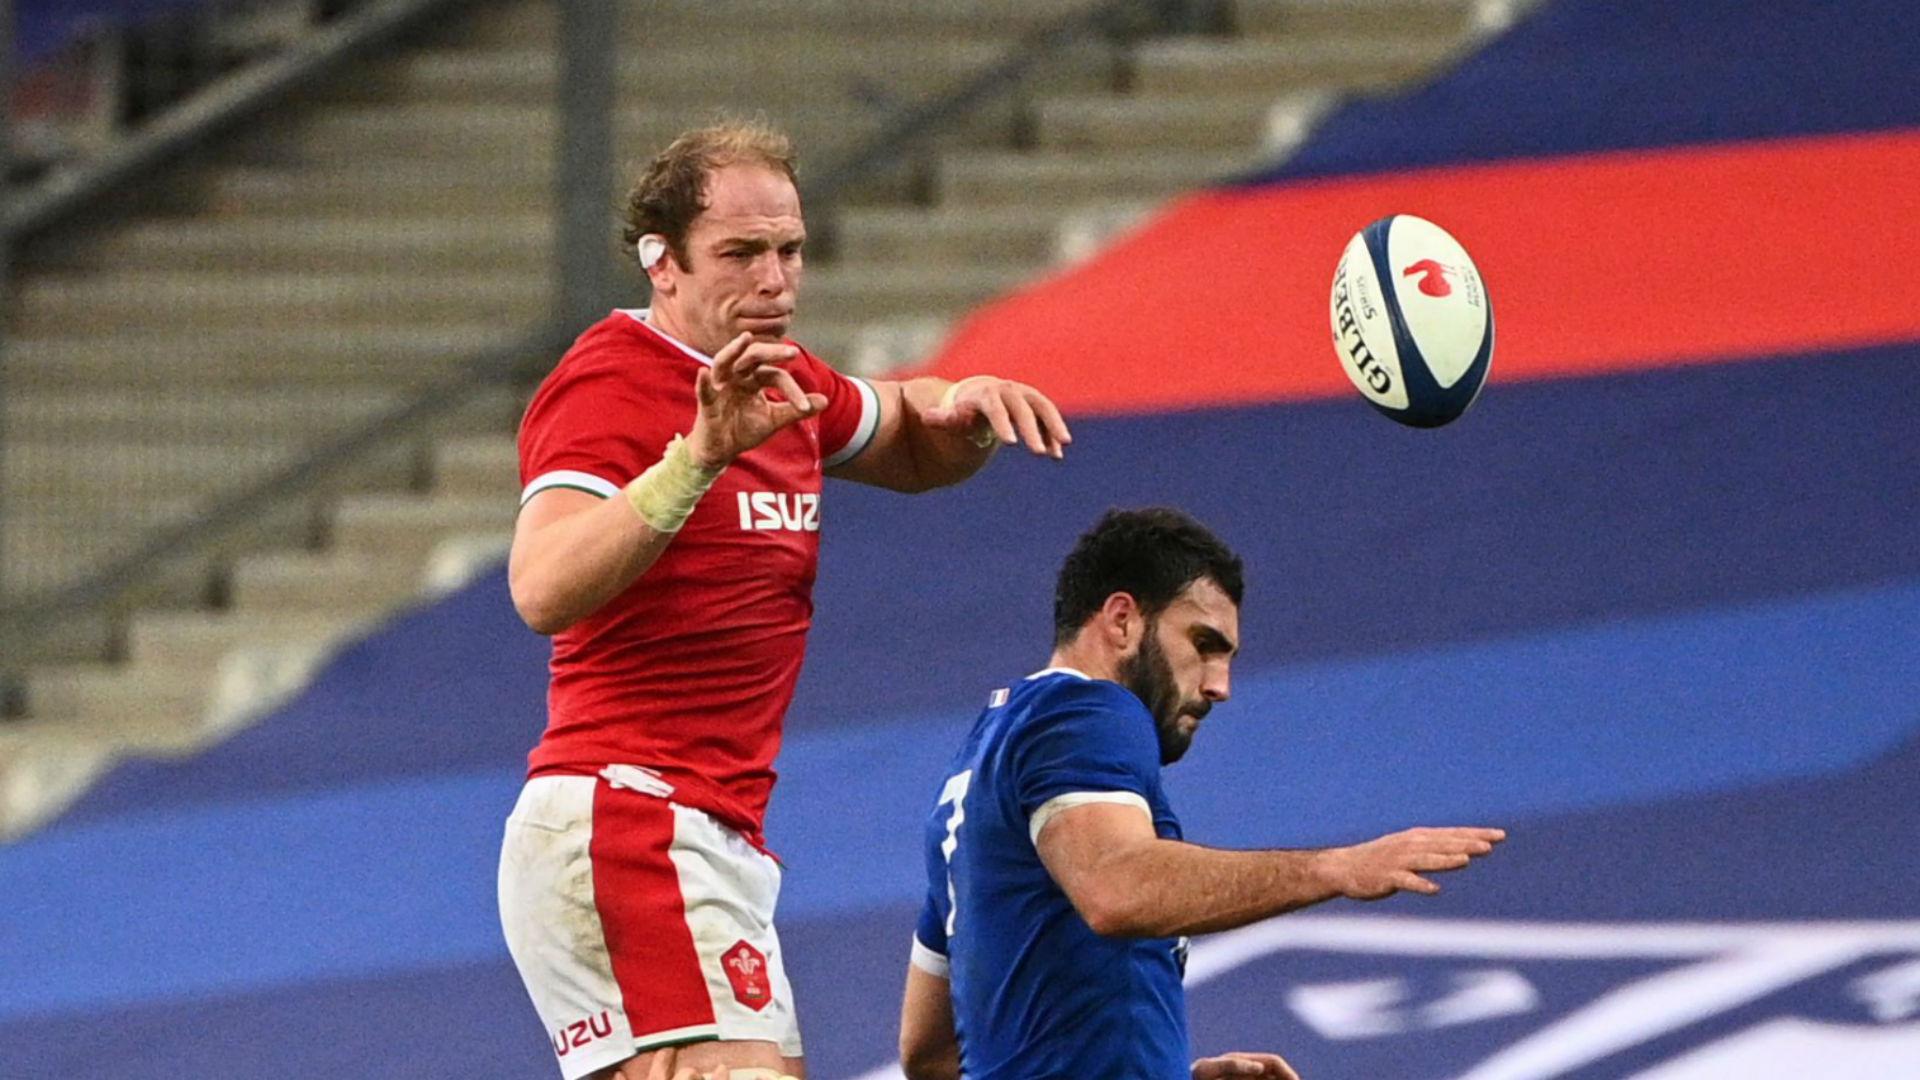 France 38-21 Wales: Dupont double spoils Jones landmark appearance